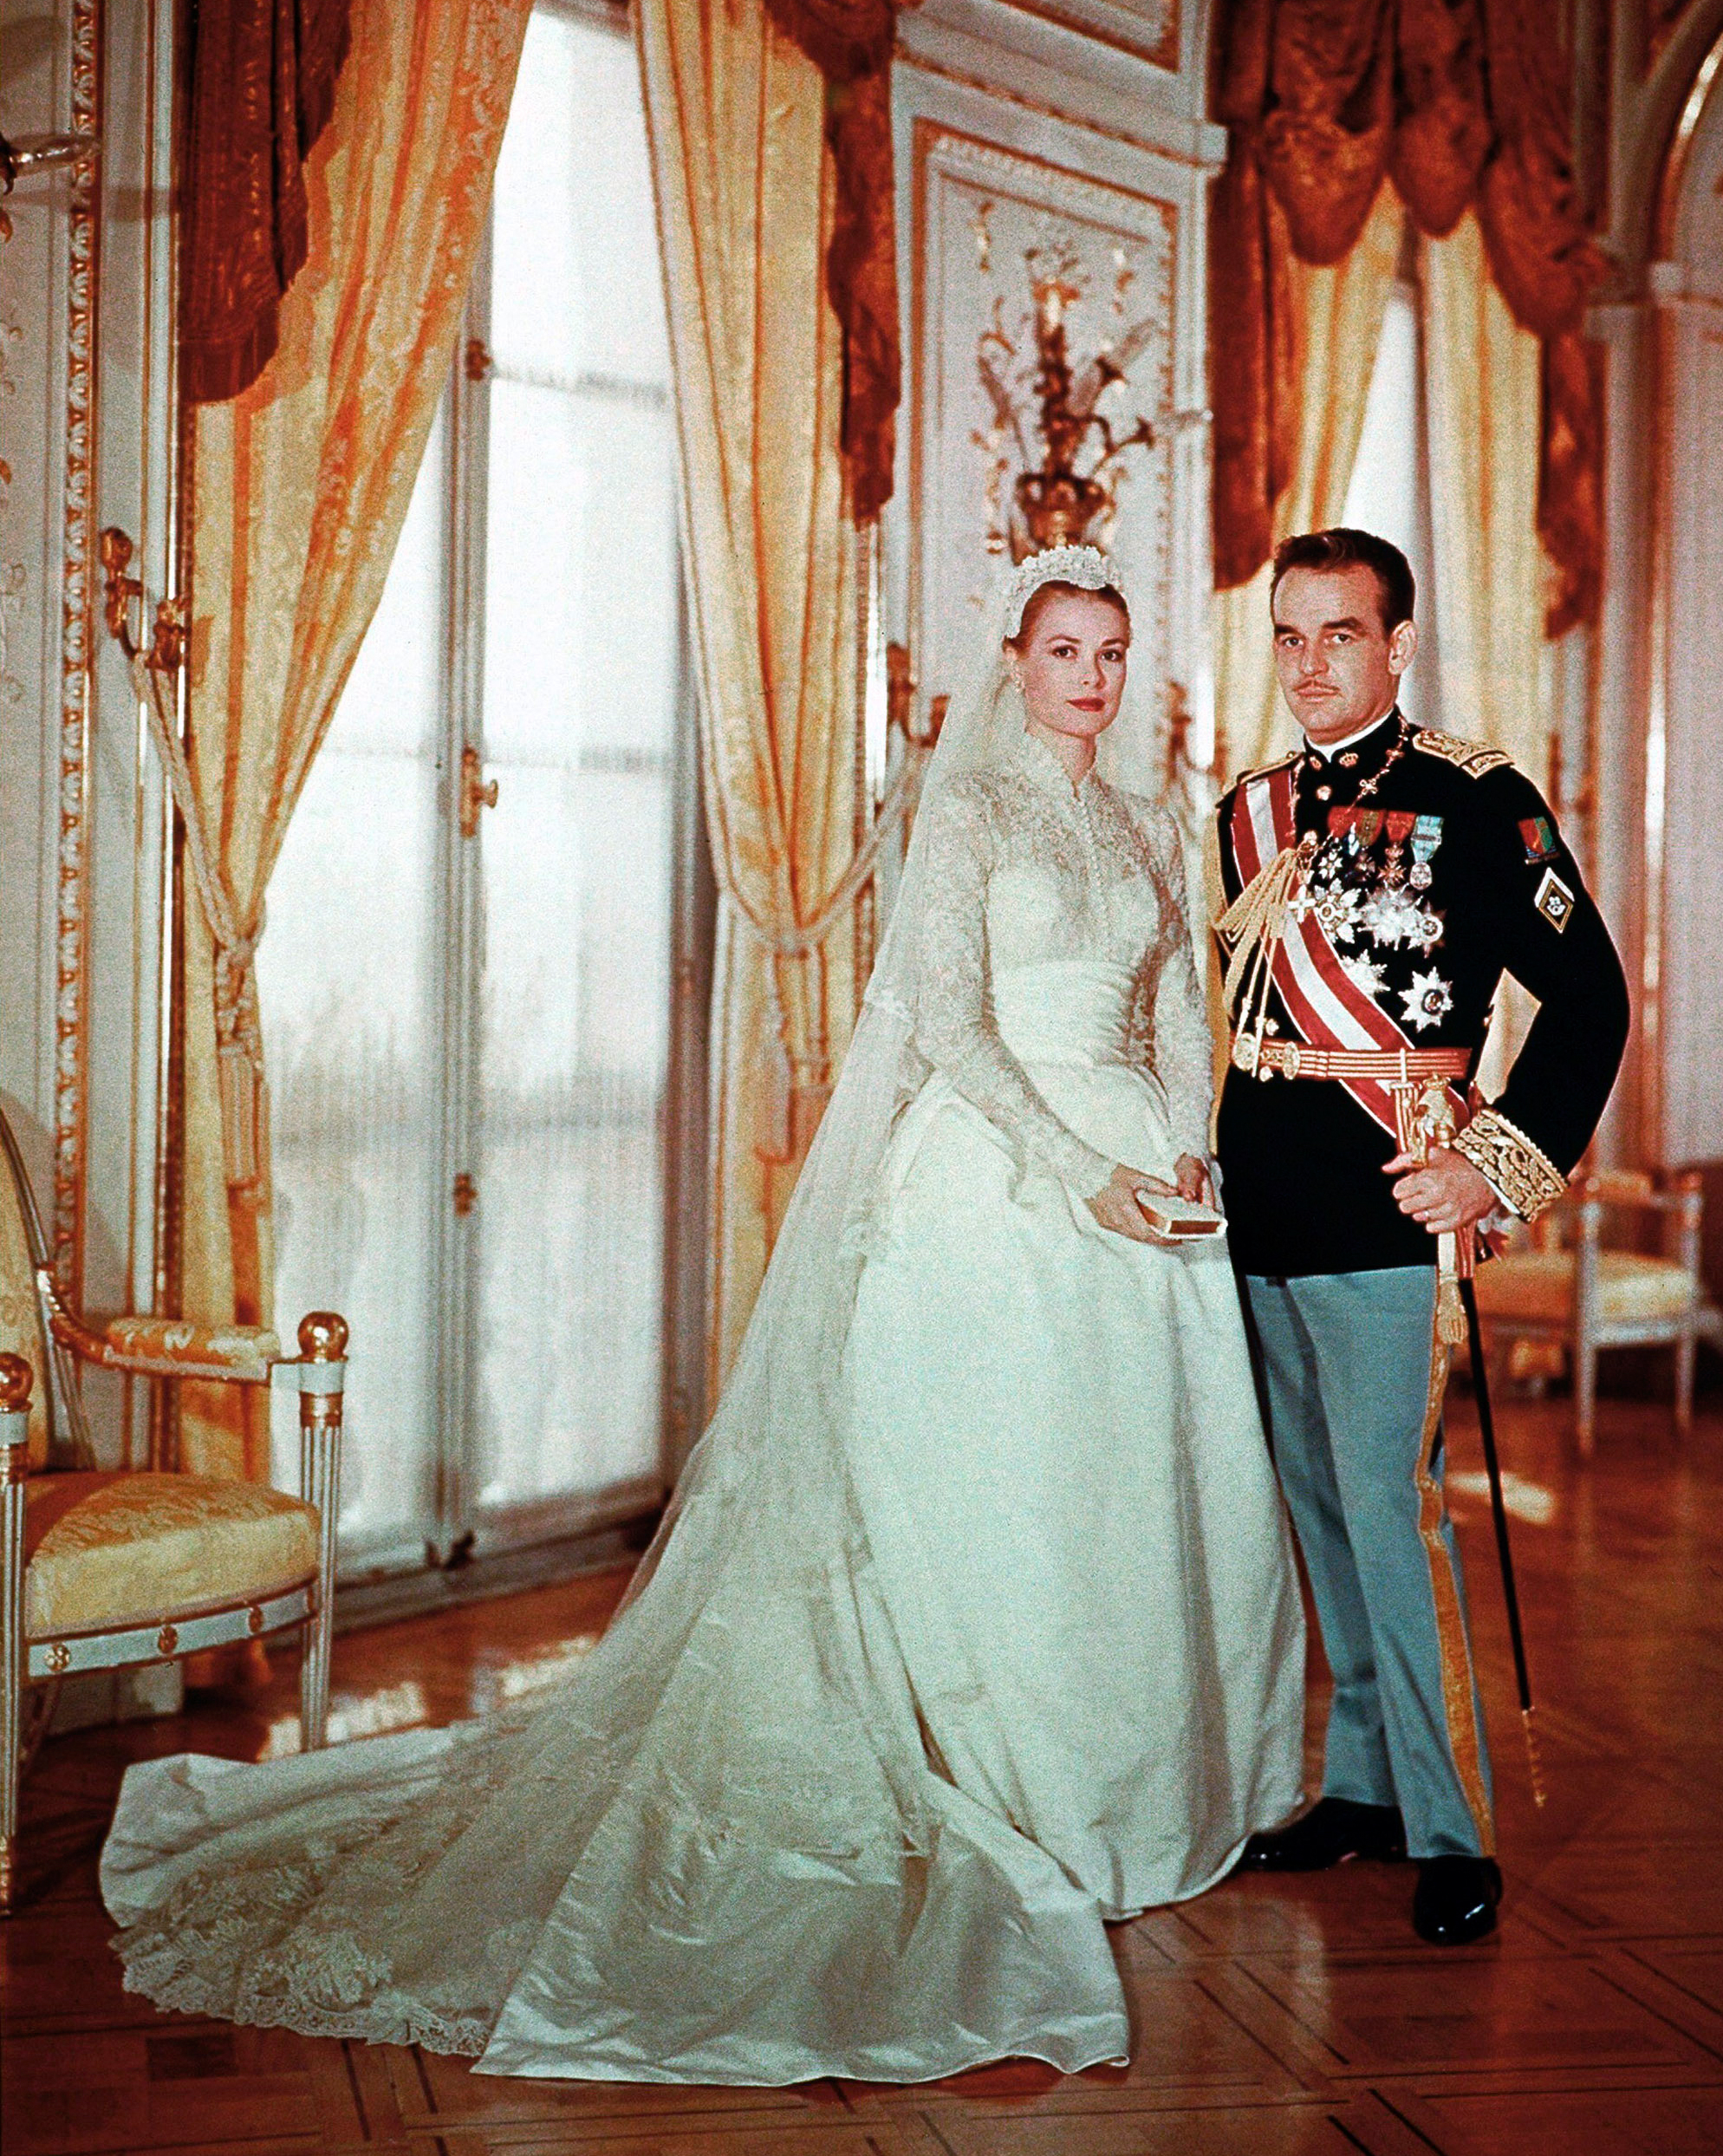 royal-wedding-dress-grace-kelly-monaco-117078422-1115.jpg